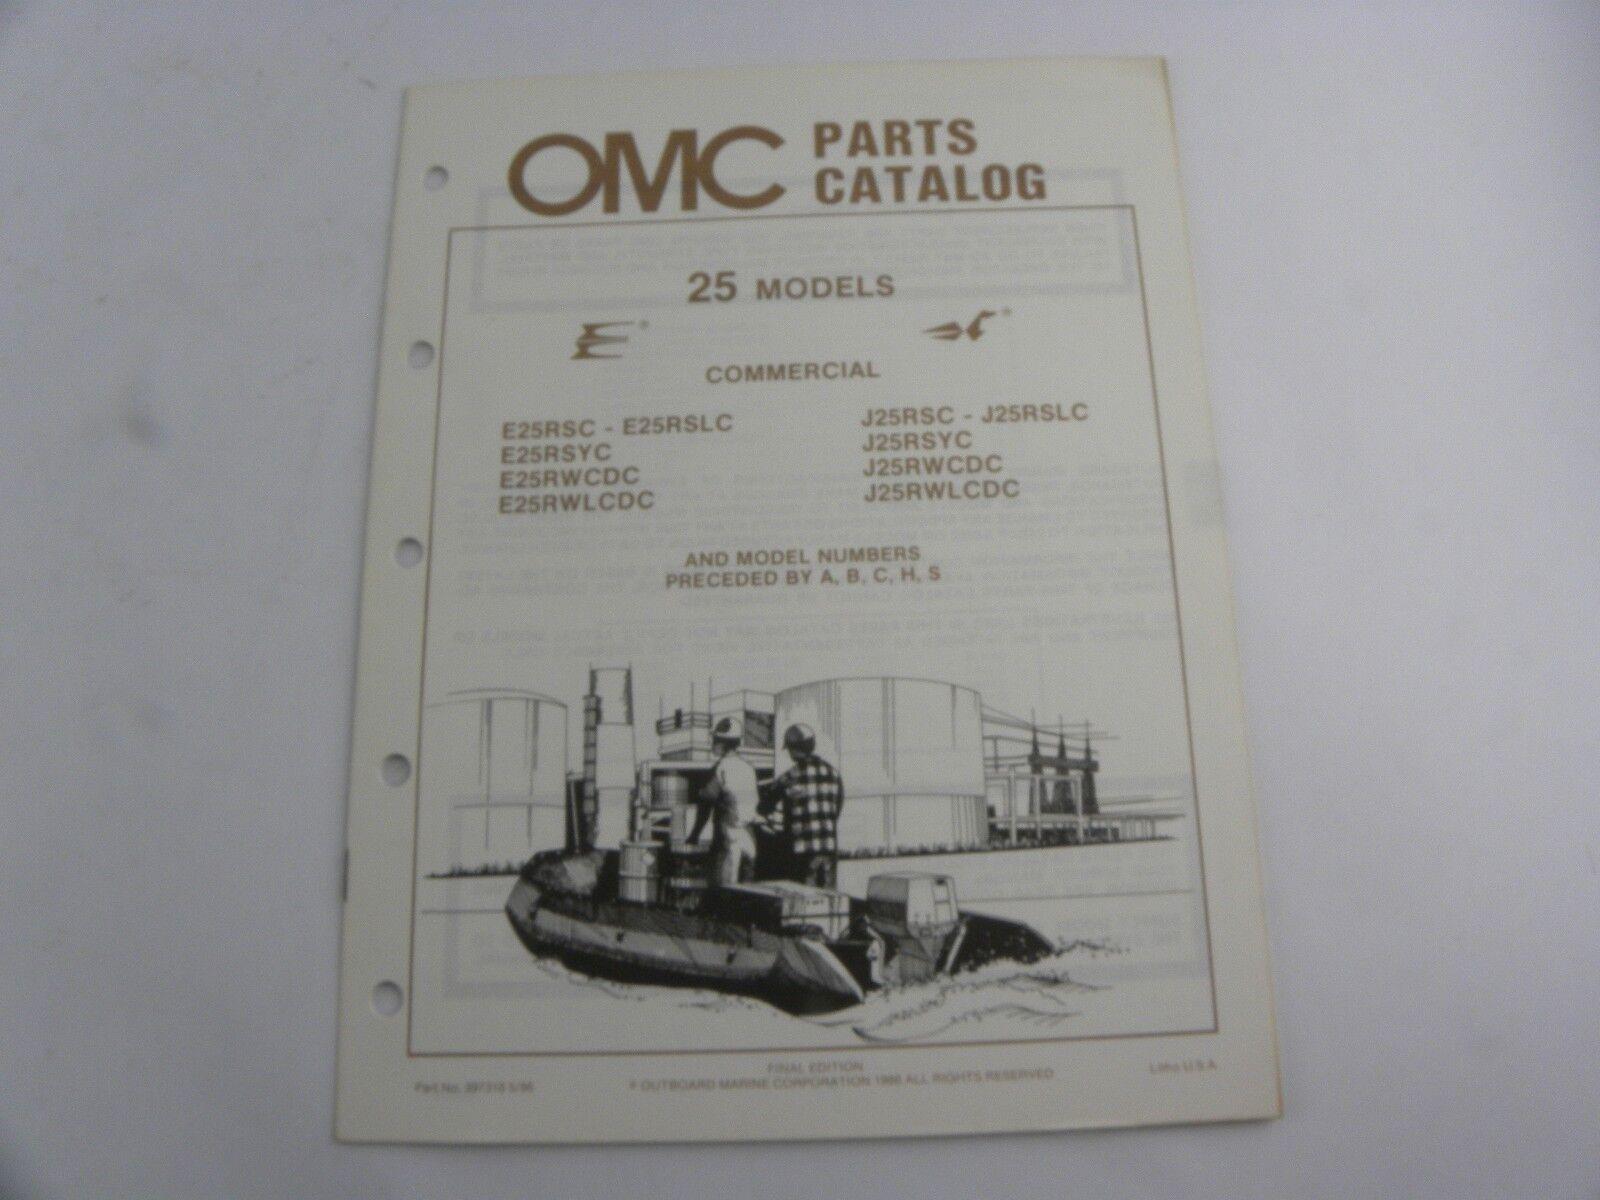 Evinrude Johnson 25 Models Outboard Motor Parts Catalog Manual 1986 OMC